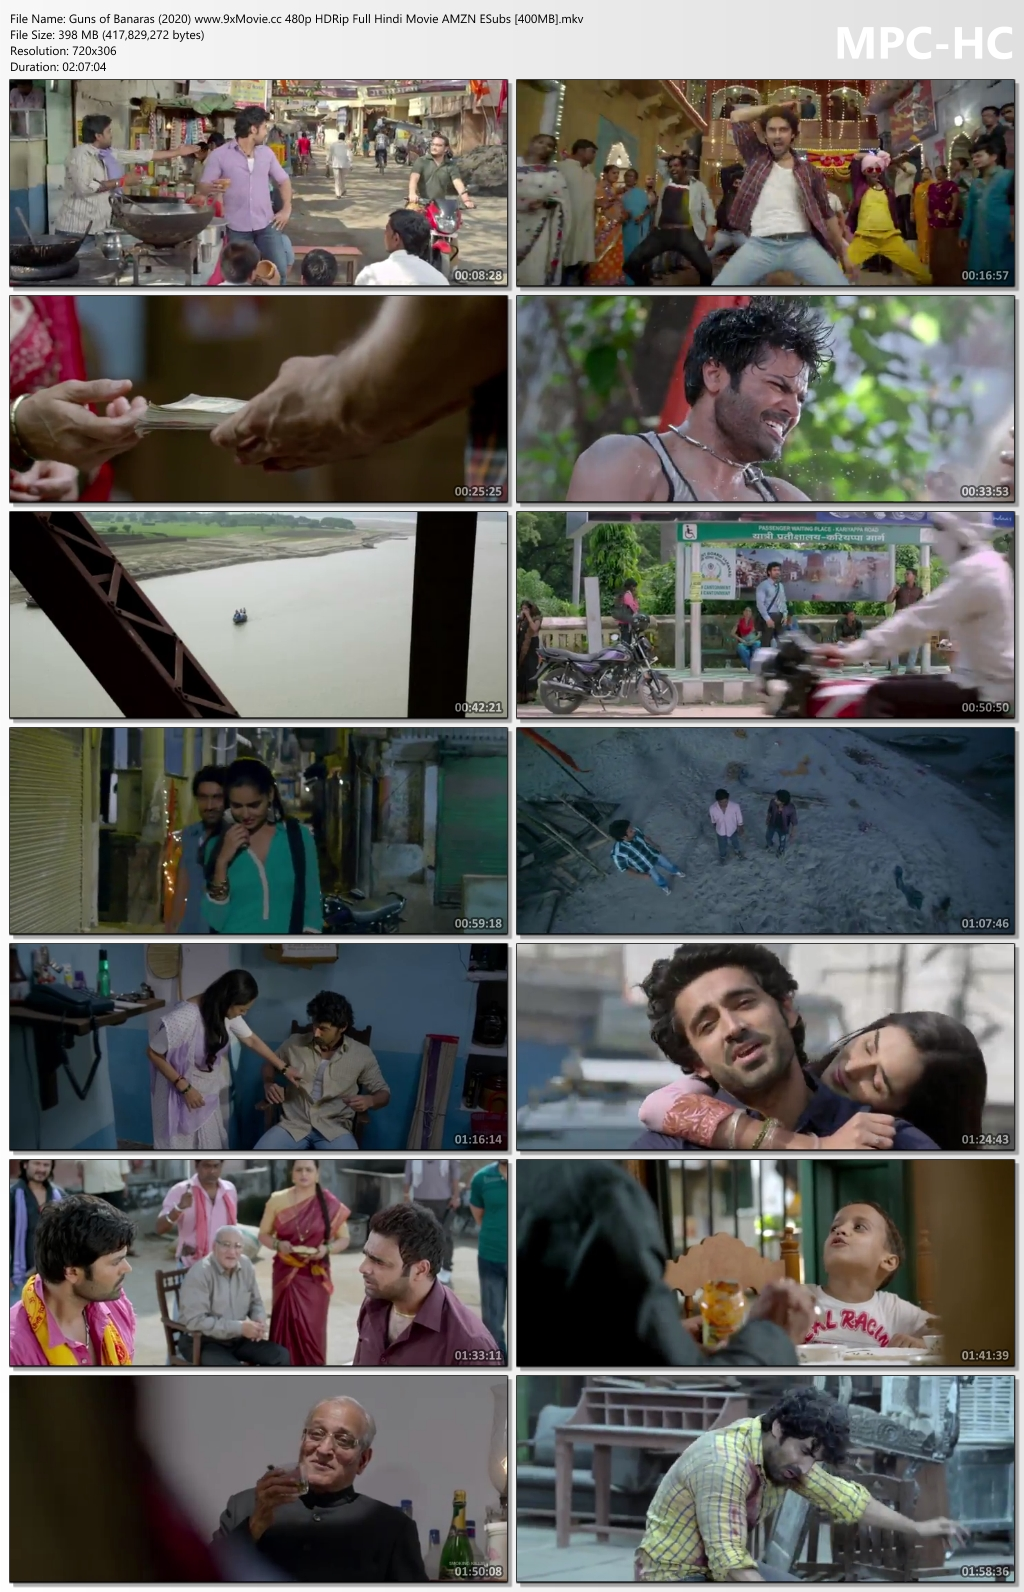 Guns-of-Banaras-2020-www-9x-Movie-cc-480p-HDRip-Full-Hindi-Movie-AMZN-ESubs-400-MB-mkv